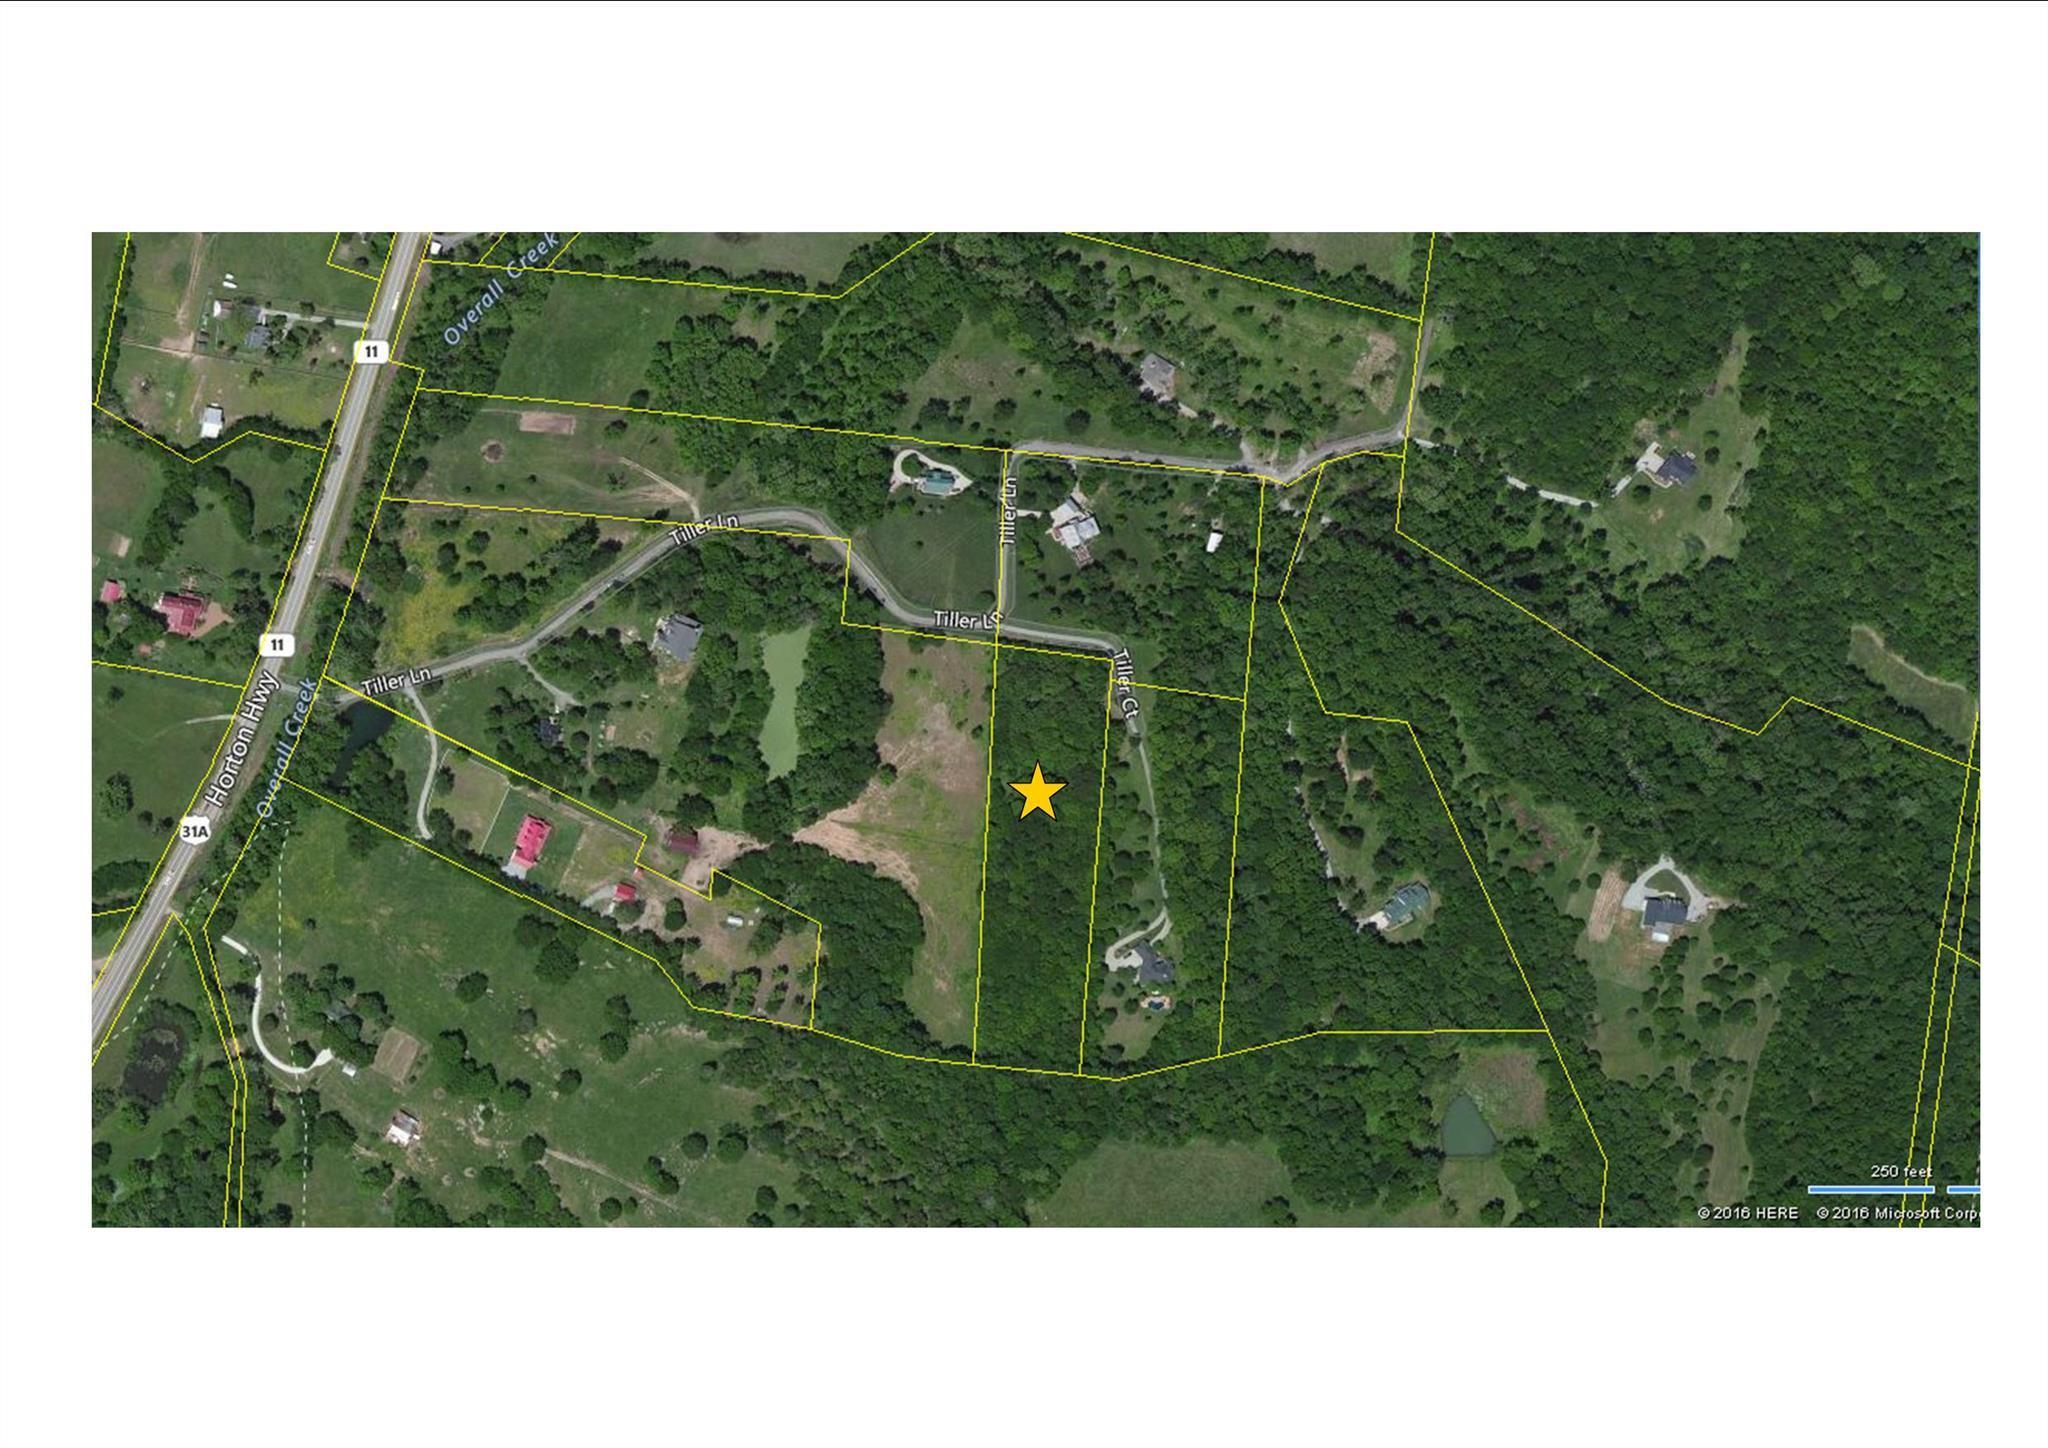 8201 Tiller Ct, College Grove, TN 37046 - College Grove, TN real estate listing